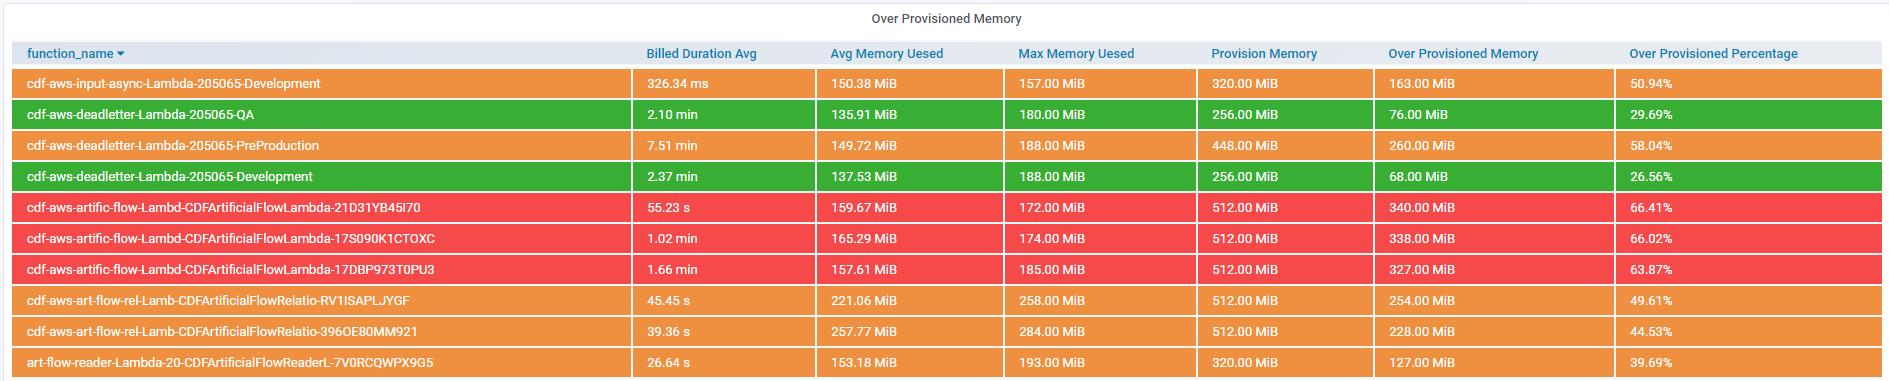 lambda_over_provisioned_memory